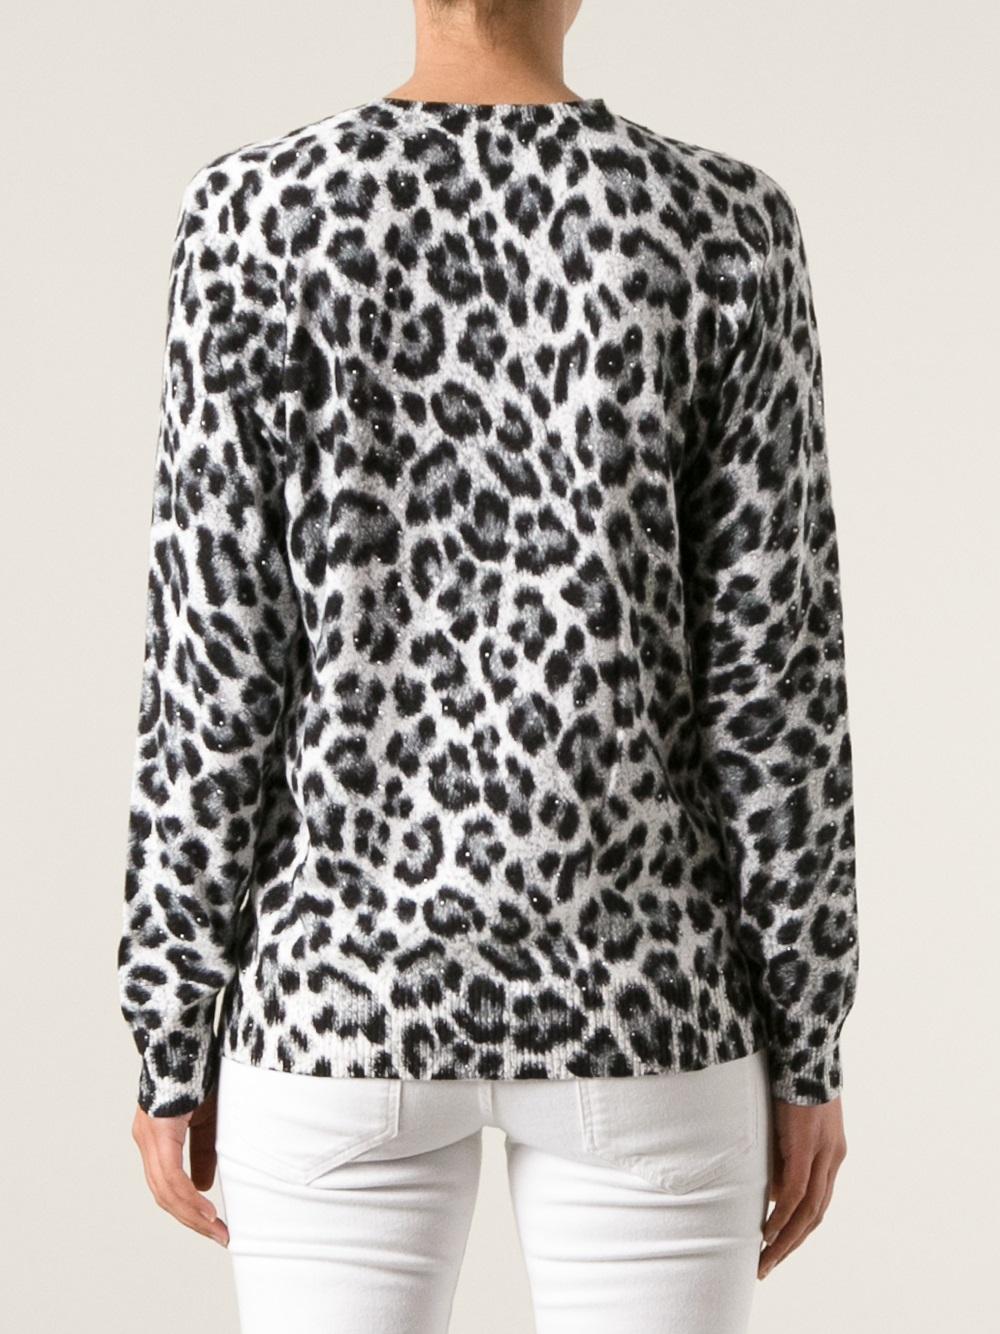 Michael michael kors Leopard Print Sweater in Black | Lyst